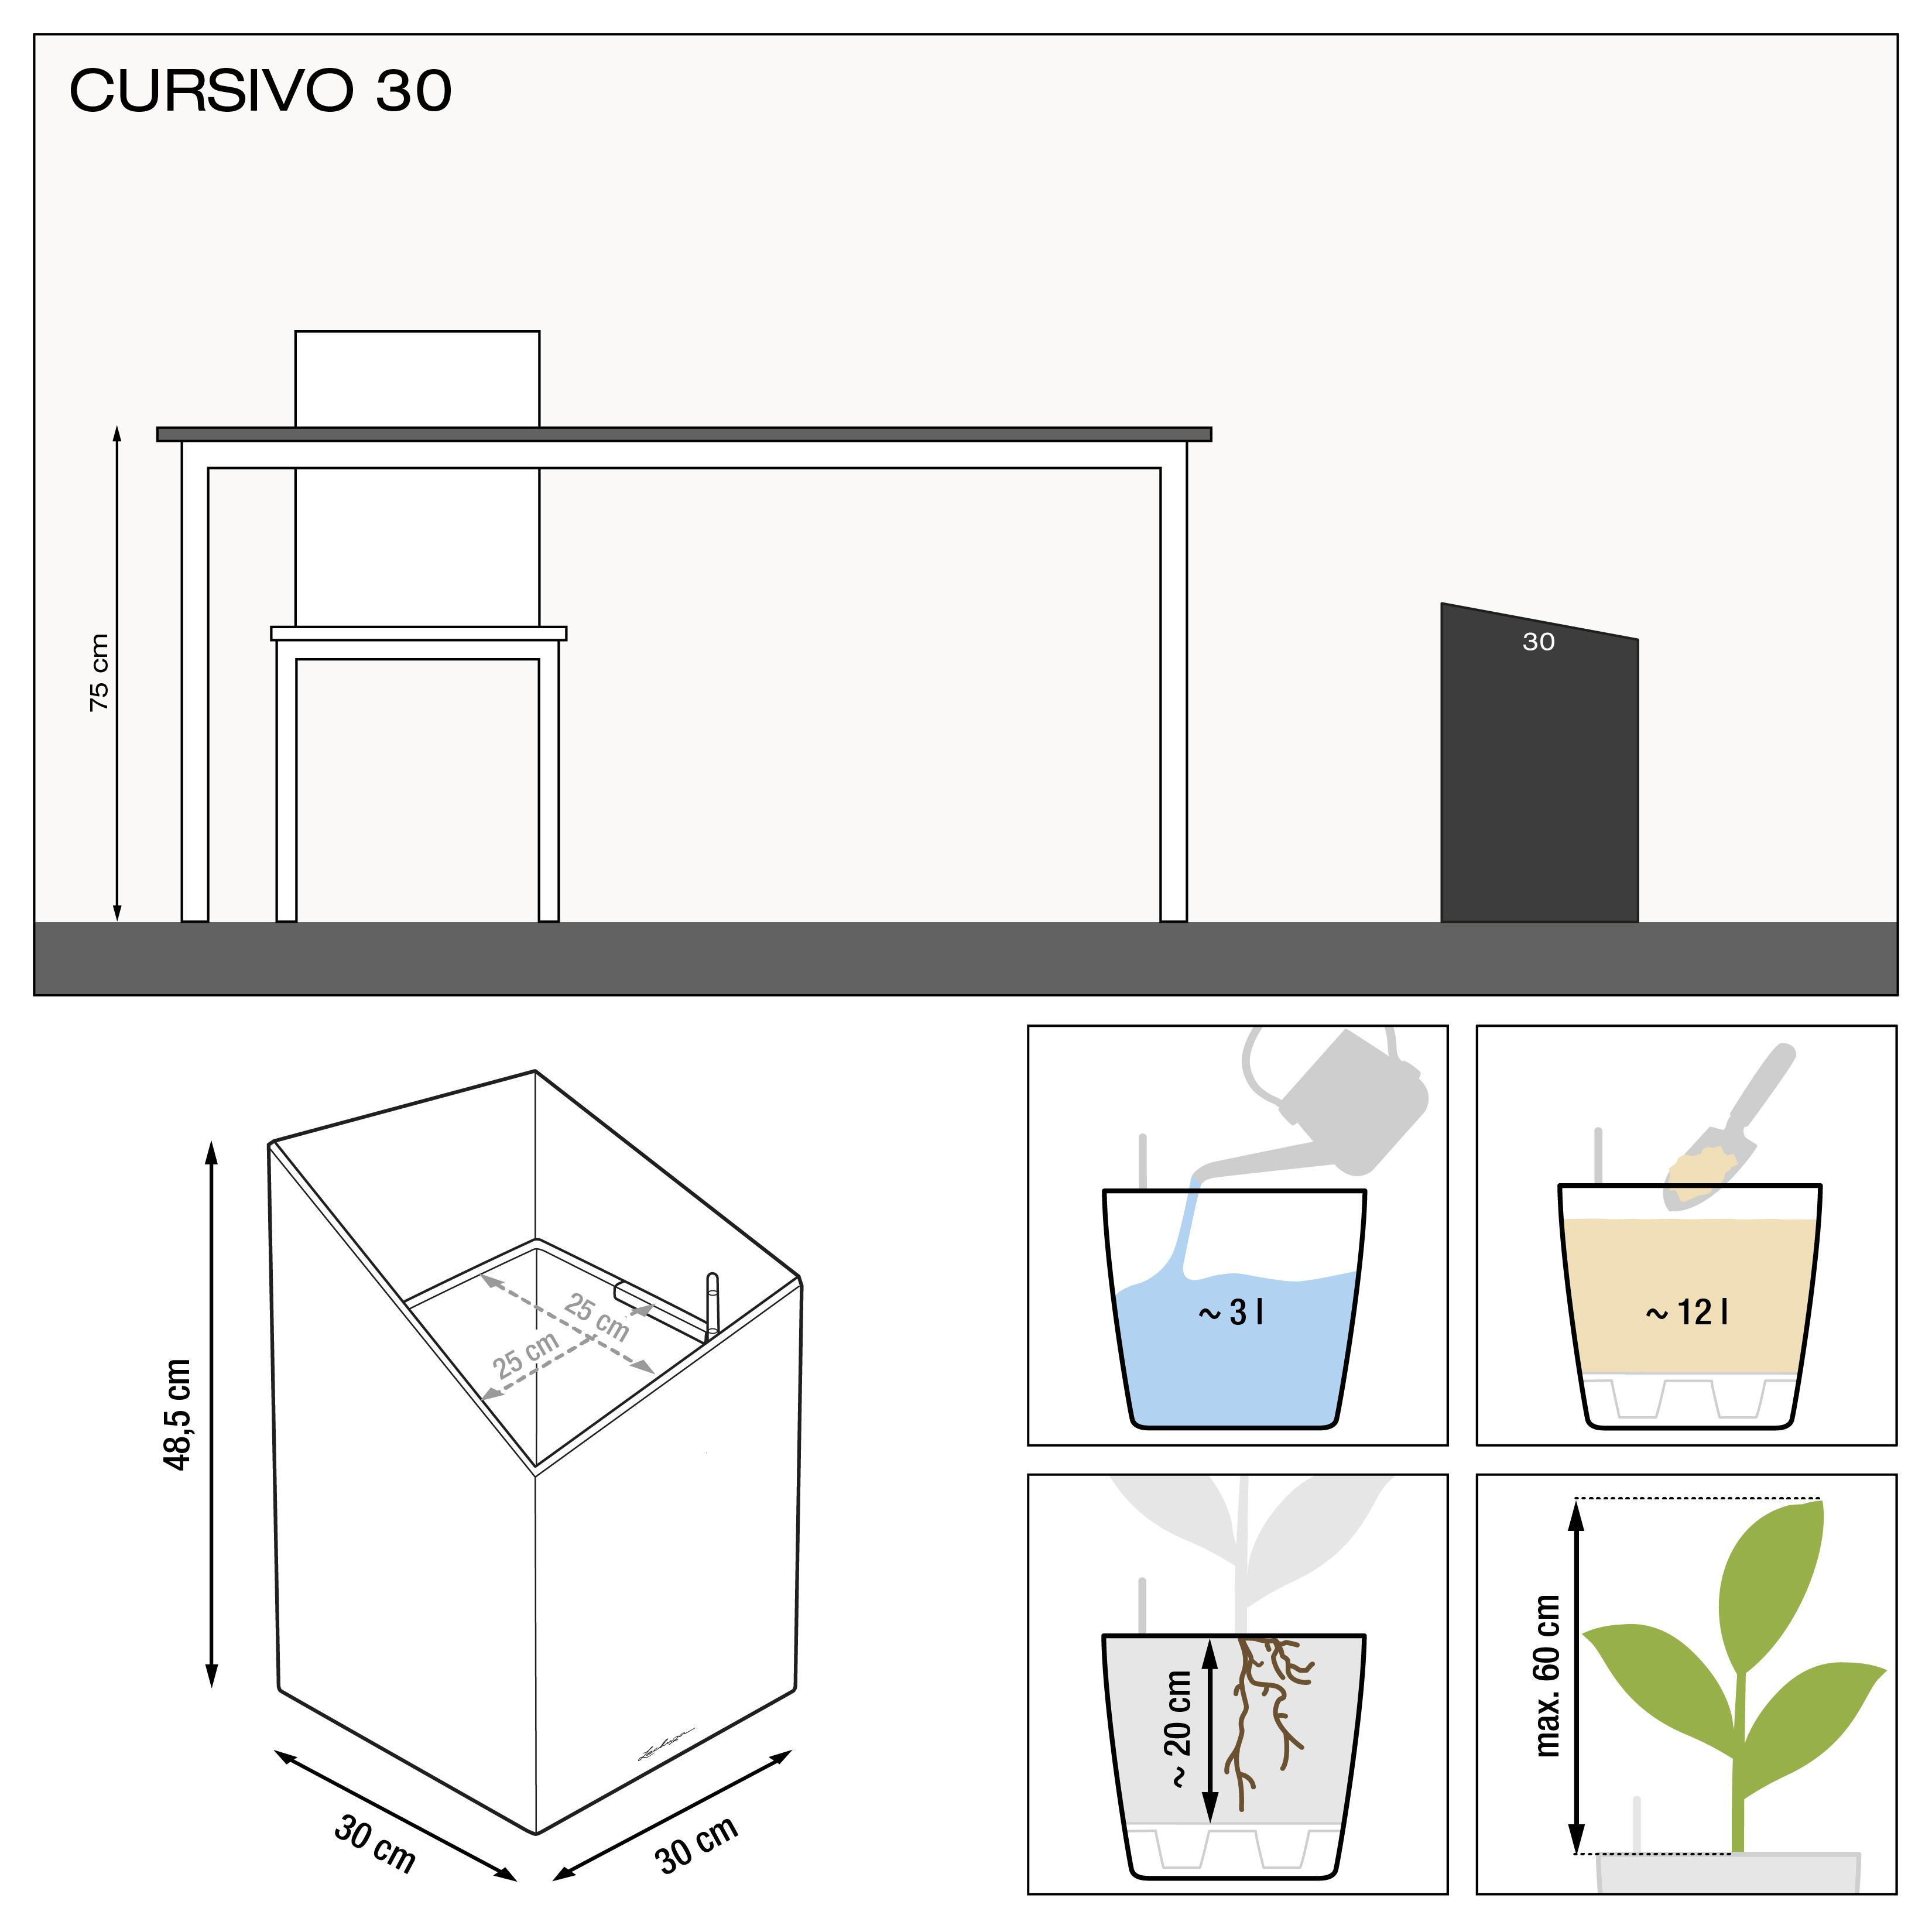 CURSIVO 30 white high-gloss - Image 3